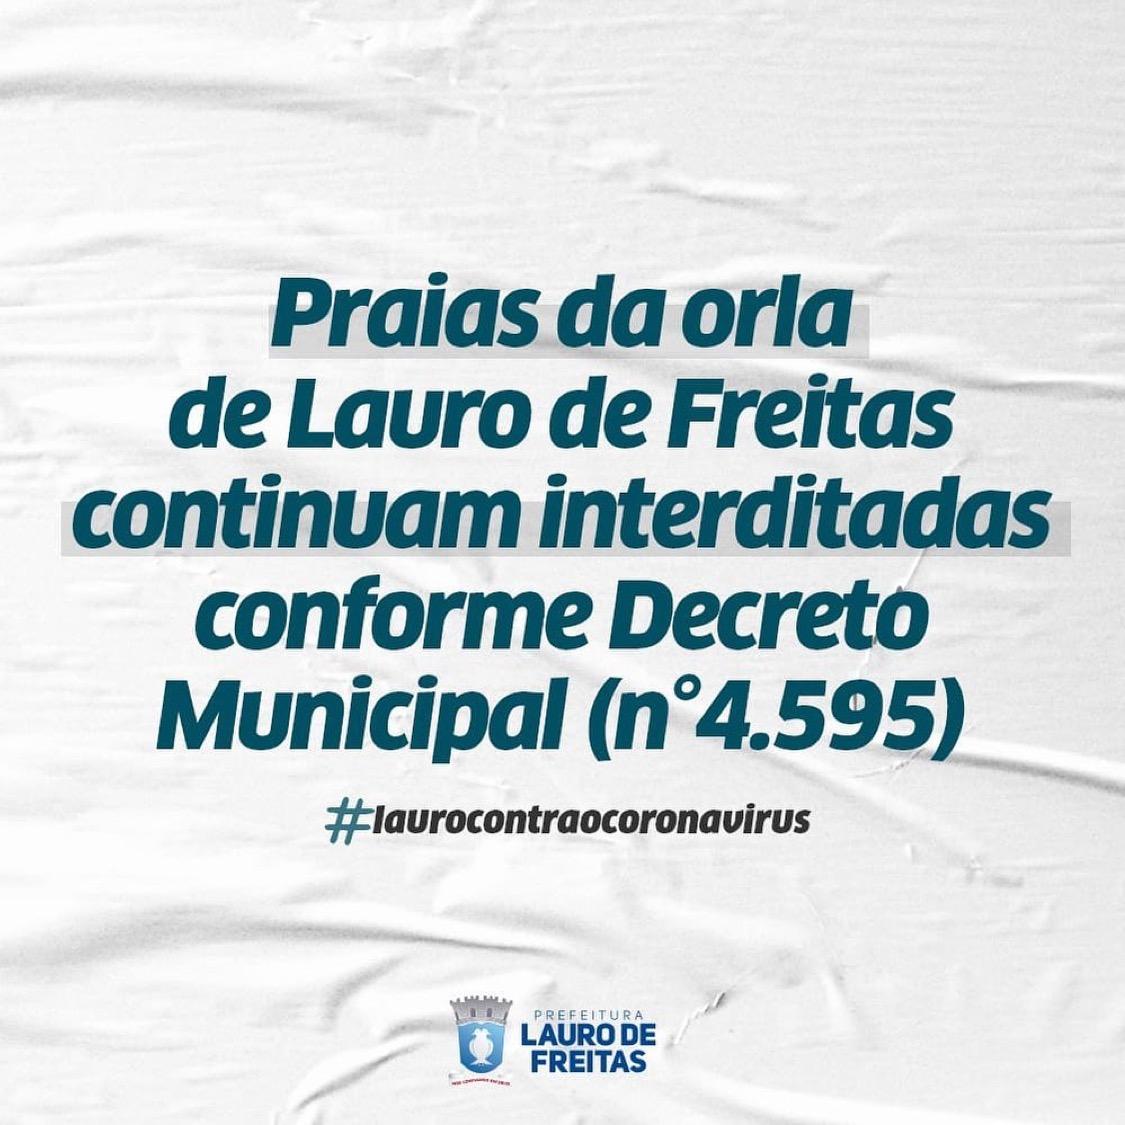 Praias da orla de Lauro de Freitas continuam interditadas